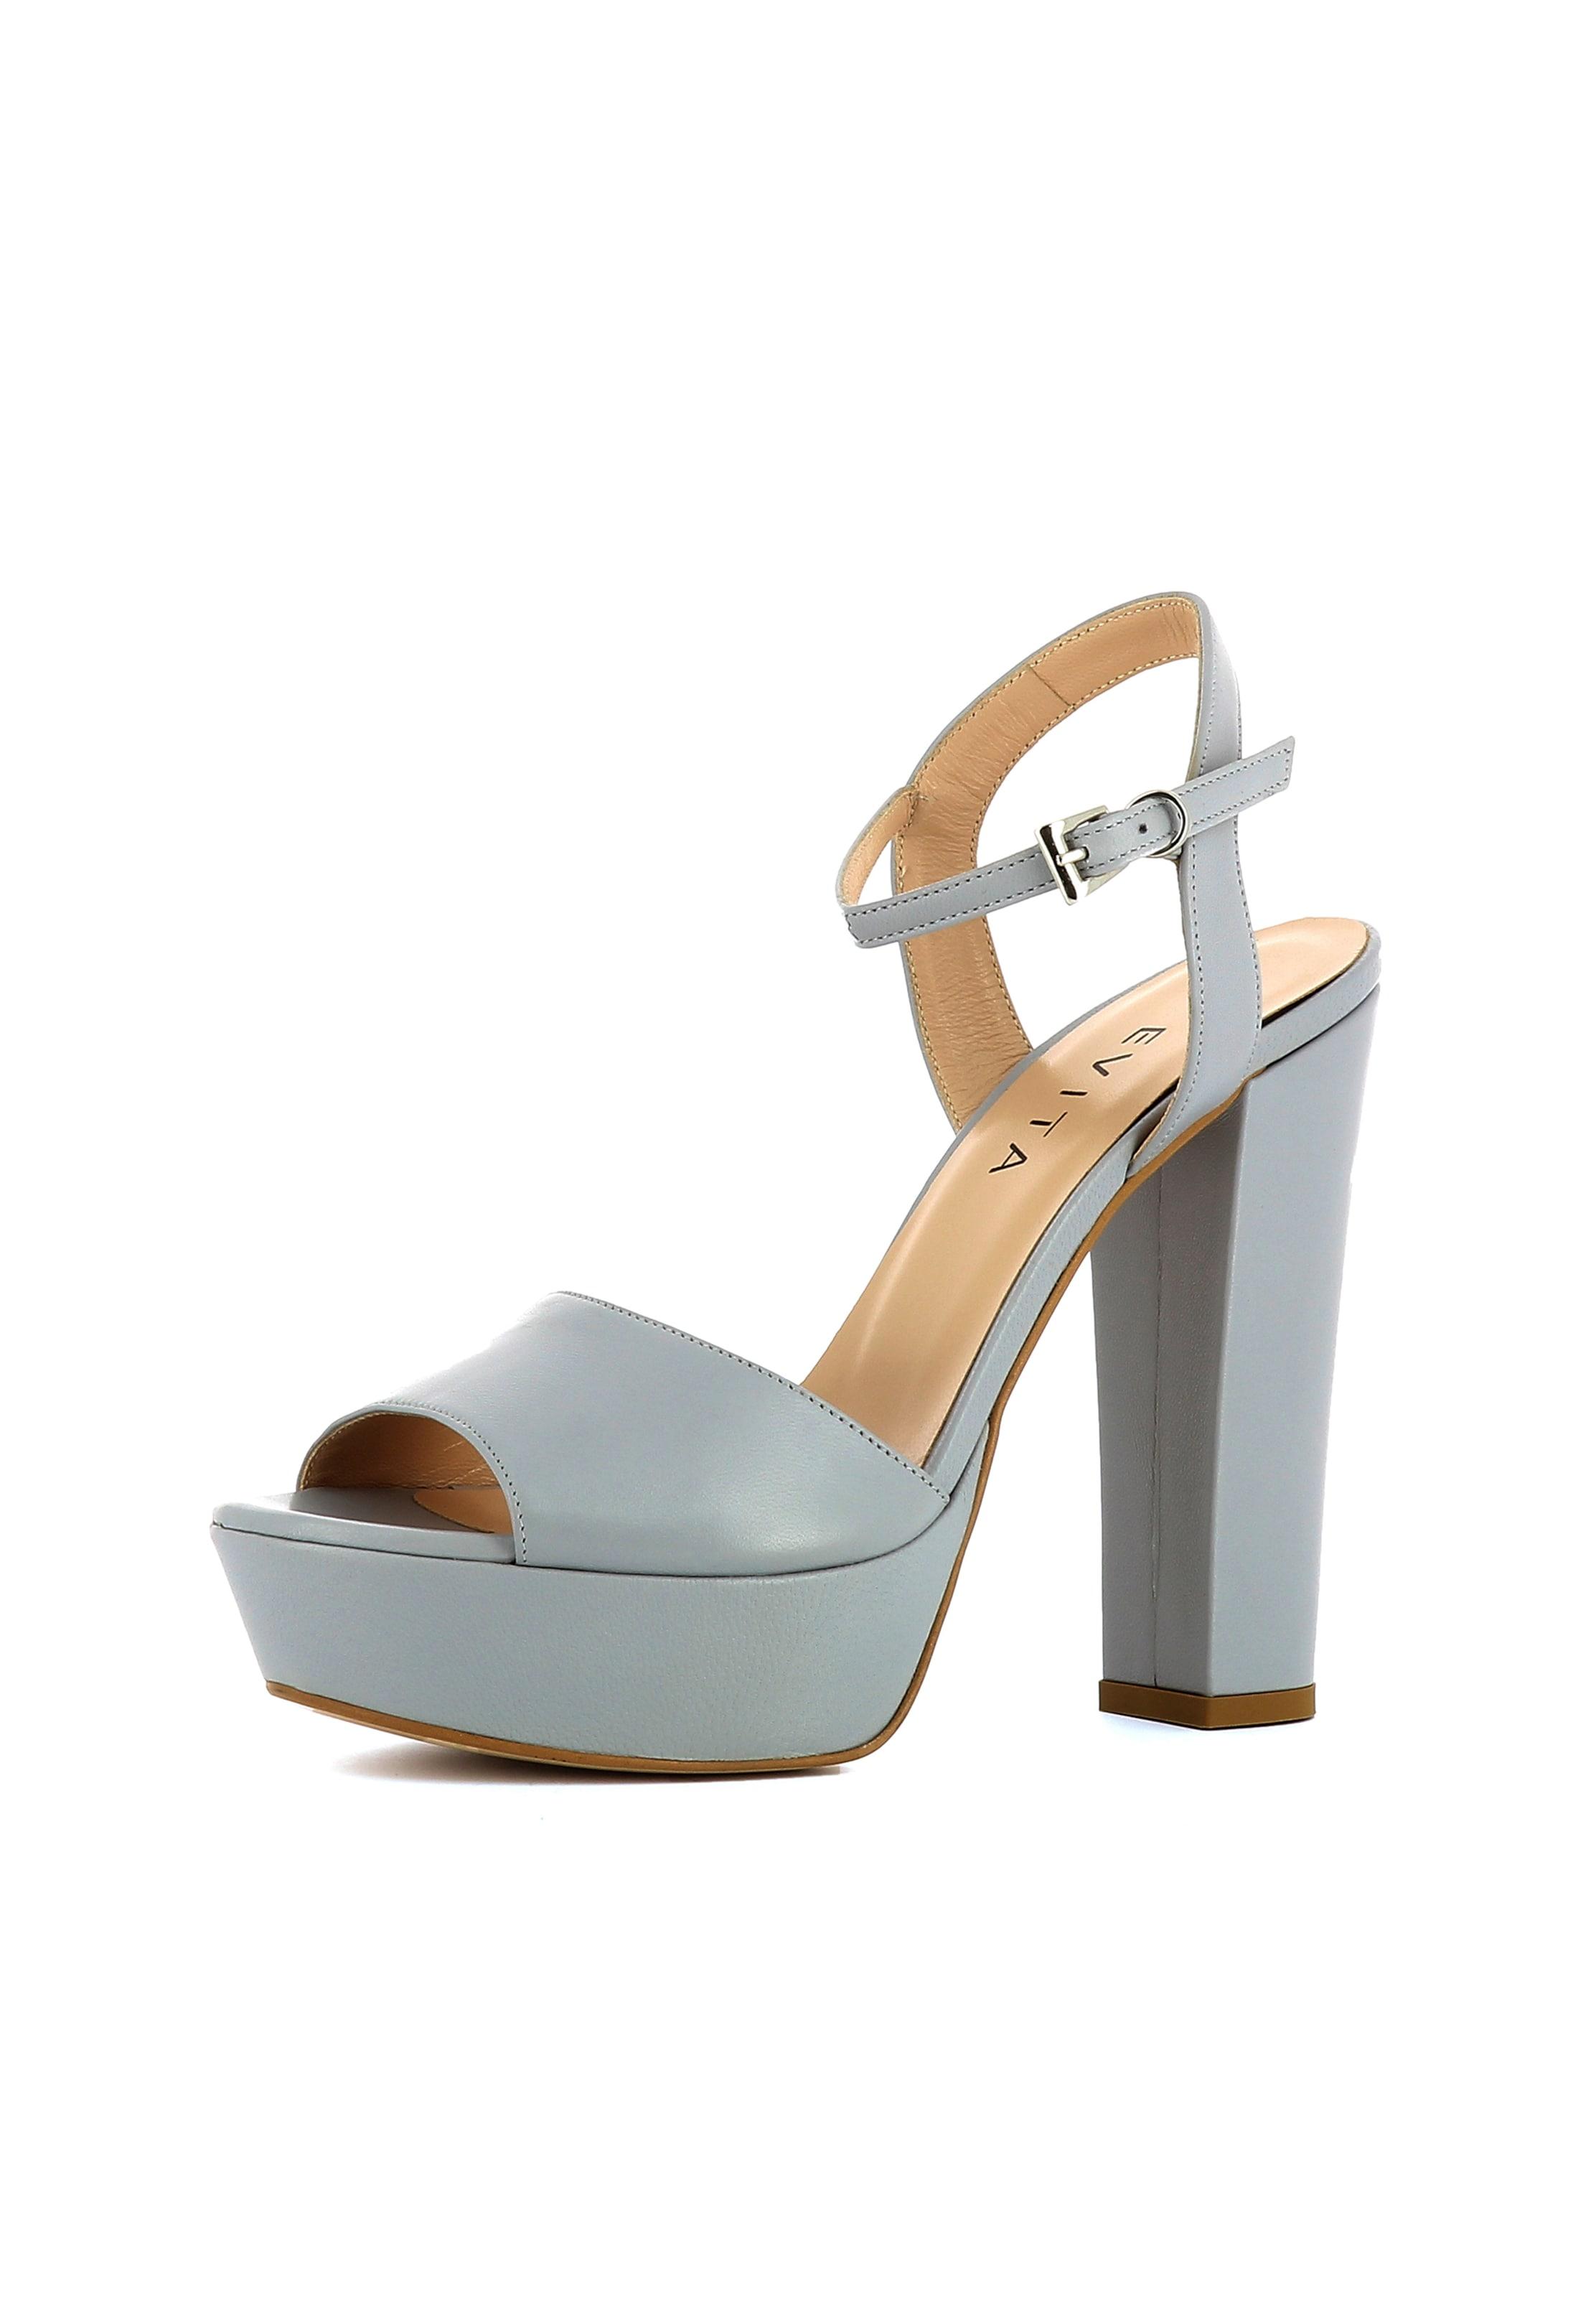 Haltbare Mode Schuhe billige Schuhe EVITA | Damen Sandalette Schuhe Mode Gut getragene Schuhe a58bc9